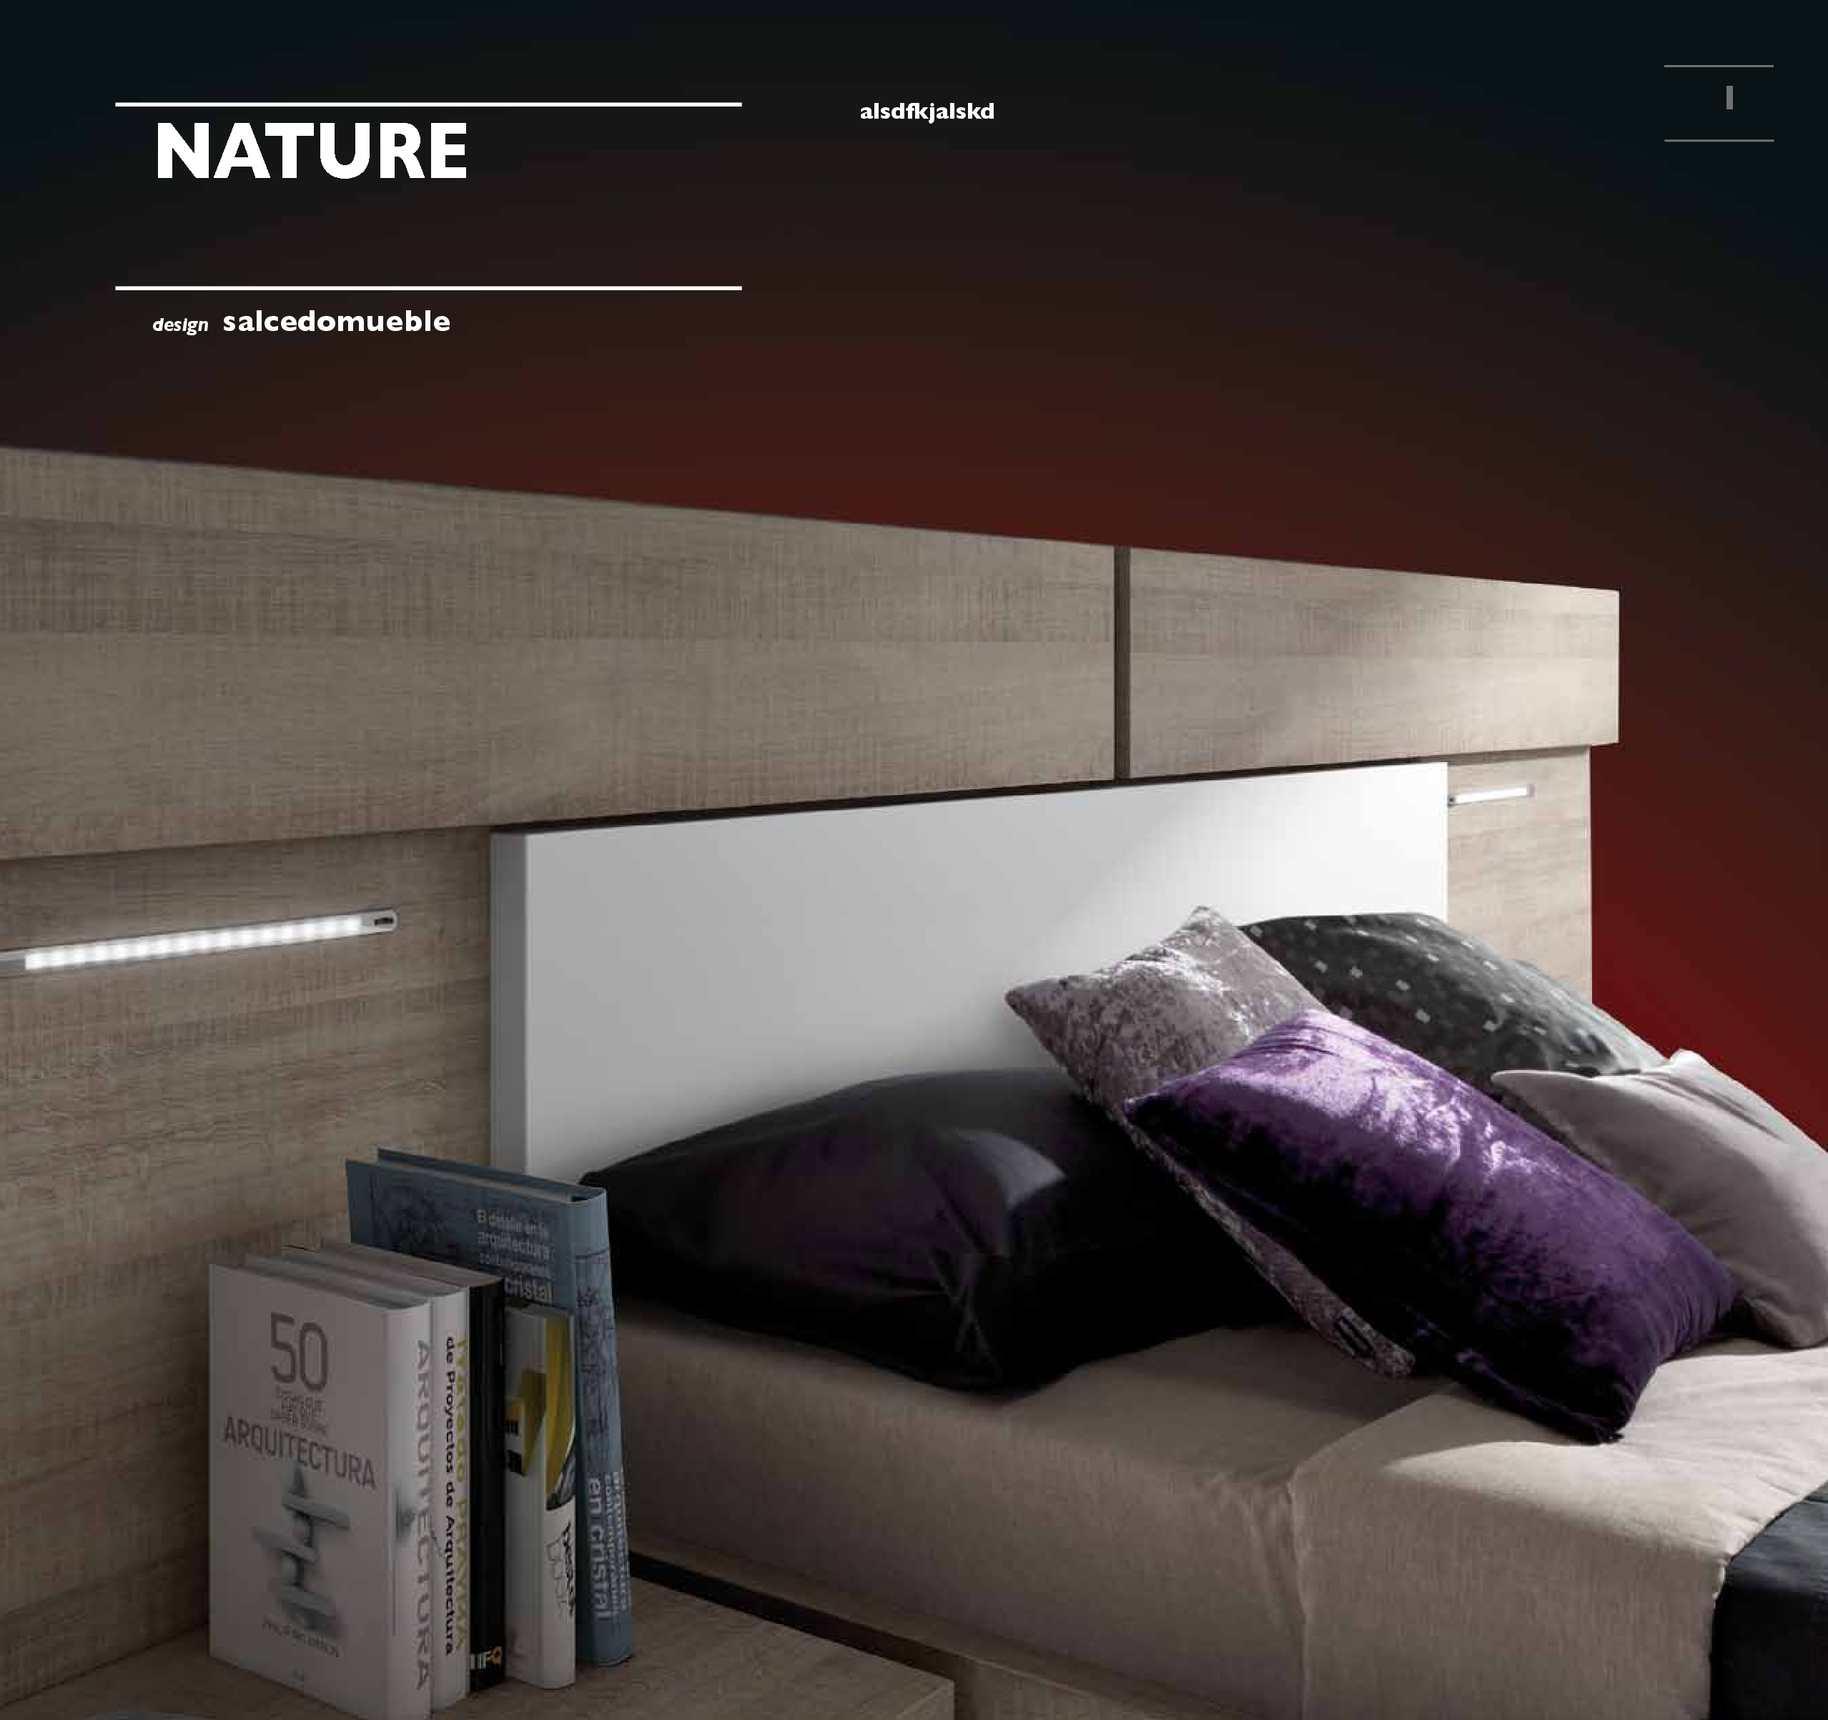 calam o muebles salcedo nature. Black Bedroom Furniture Sets. Home Design Ideas